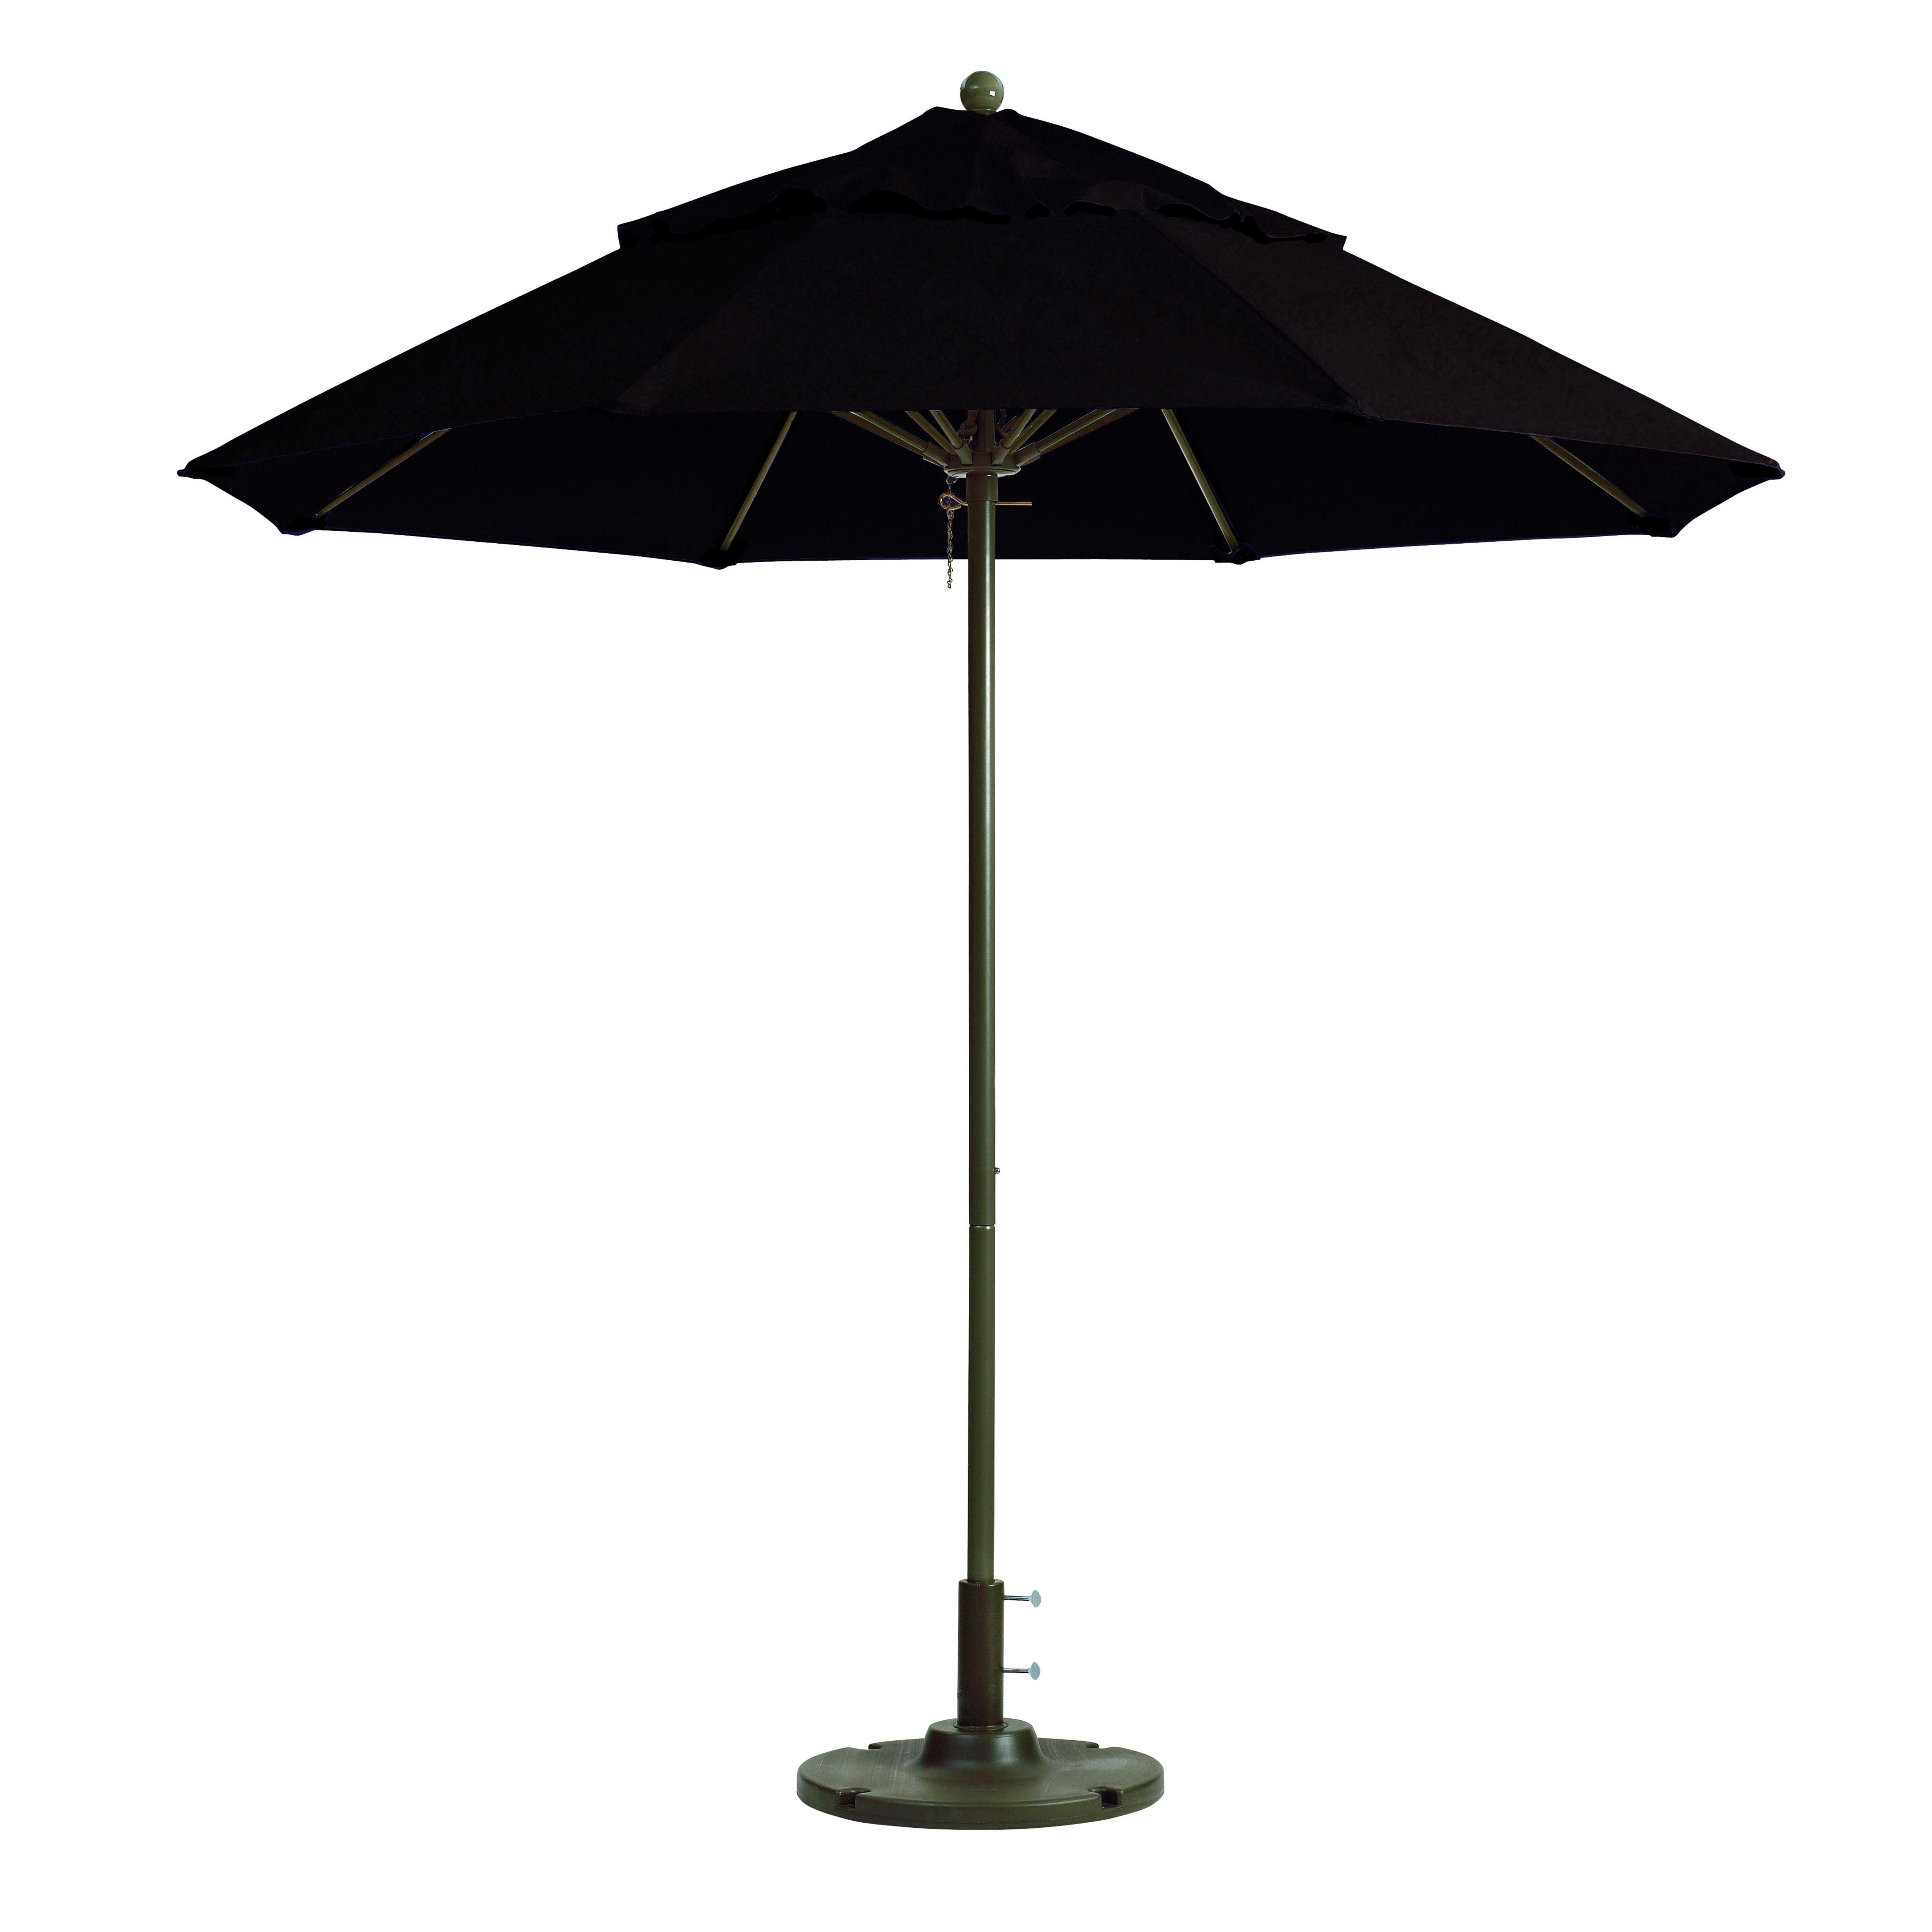 Grosfillex 98801731 umbrella